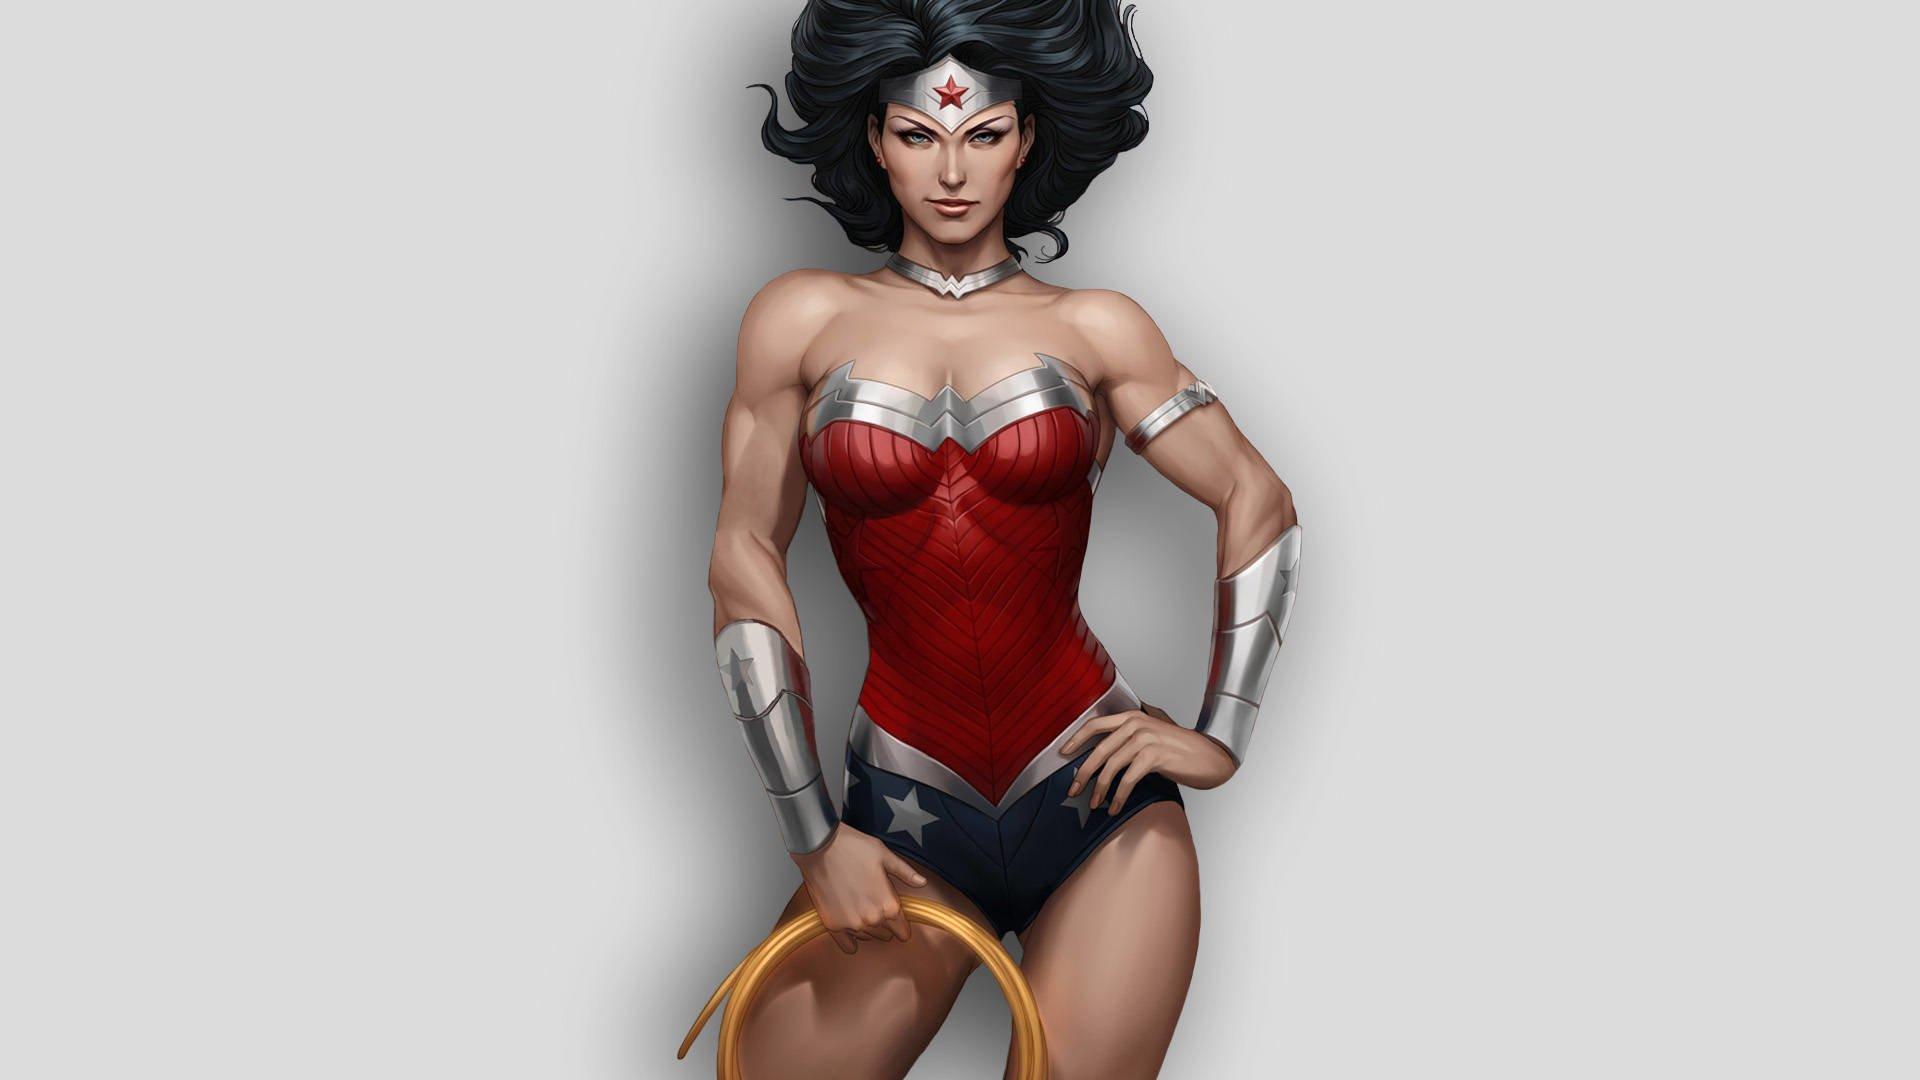 Hd wallpaper wonder woman - Hd Wallpaper Background Id 517025 1920x1080 Comics Wonder Woman